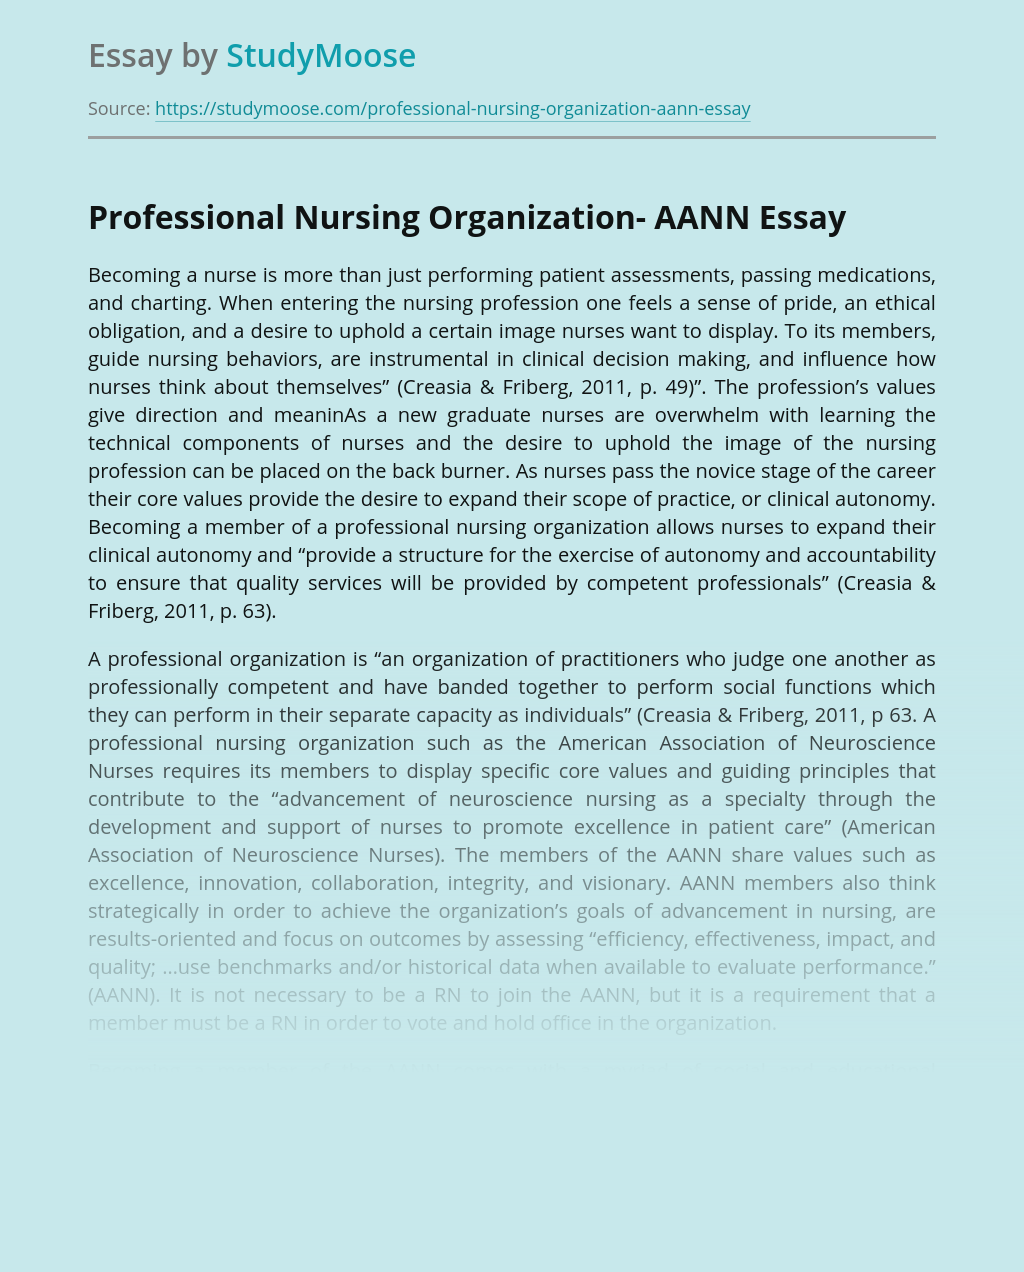 Professional Nursing Organization- AANN